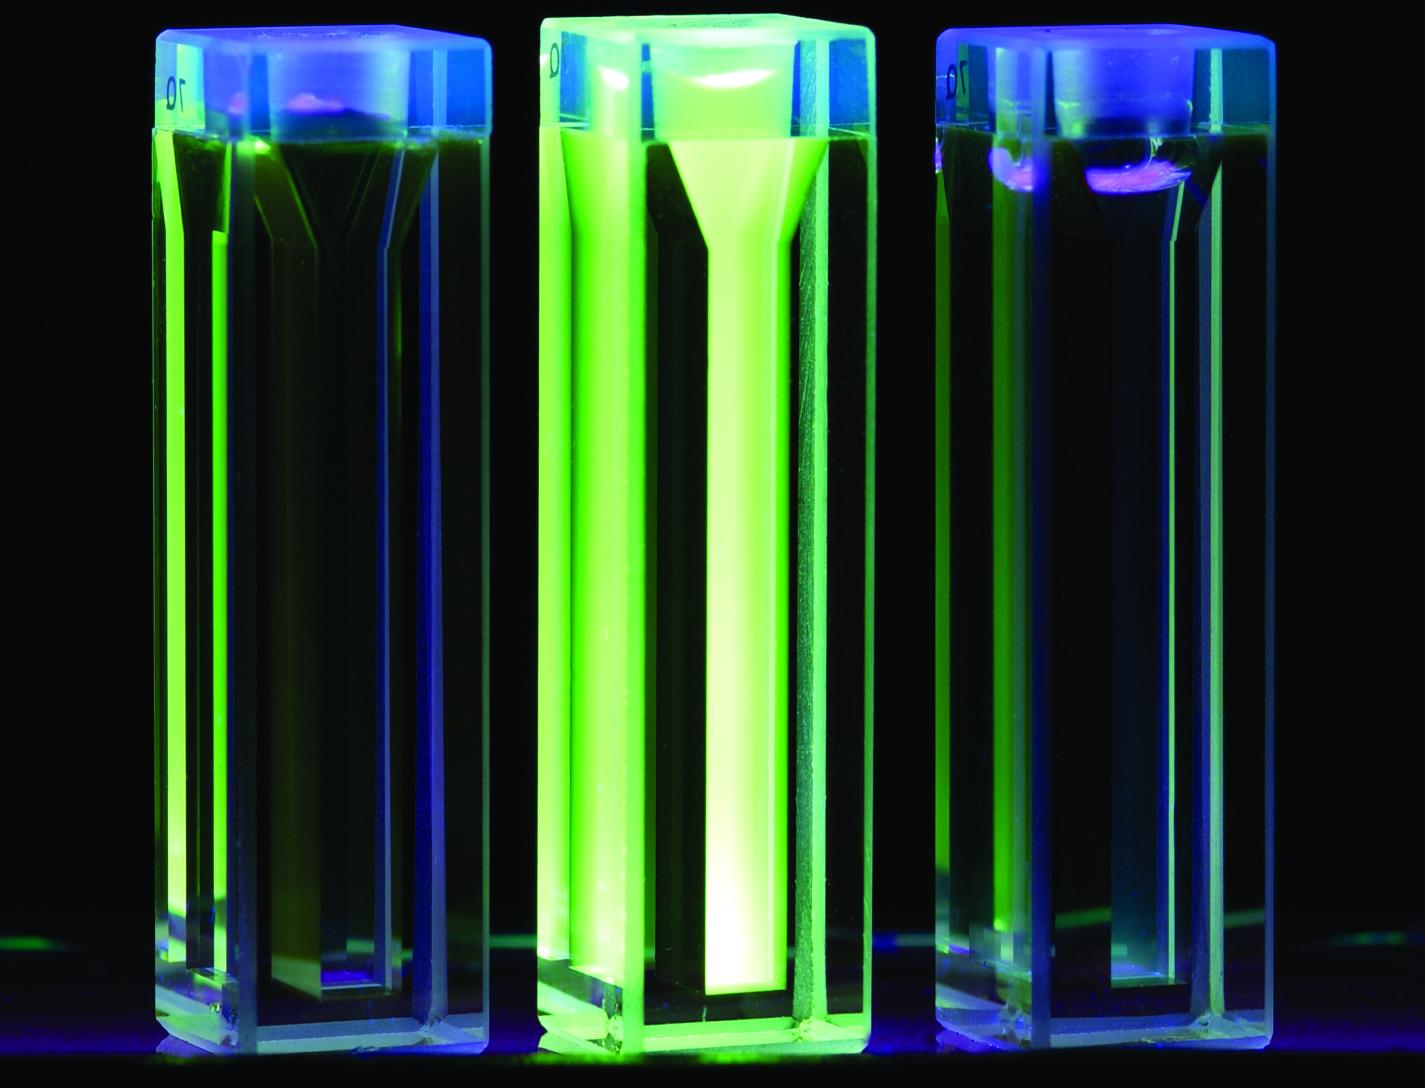 Biomarker Sensor Arrays for Microfluidics Applications